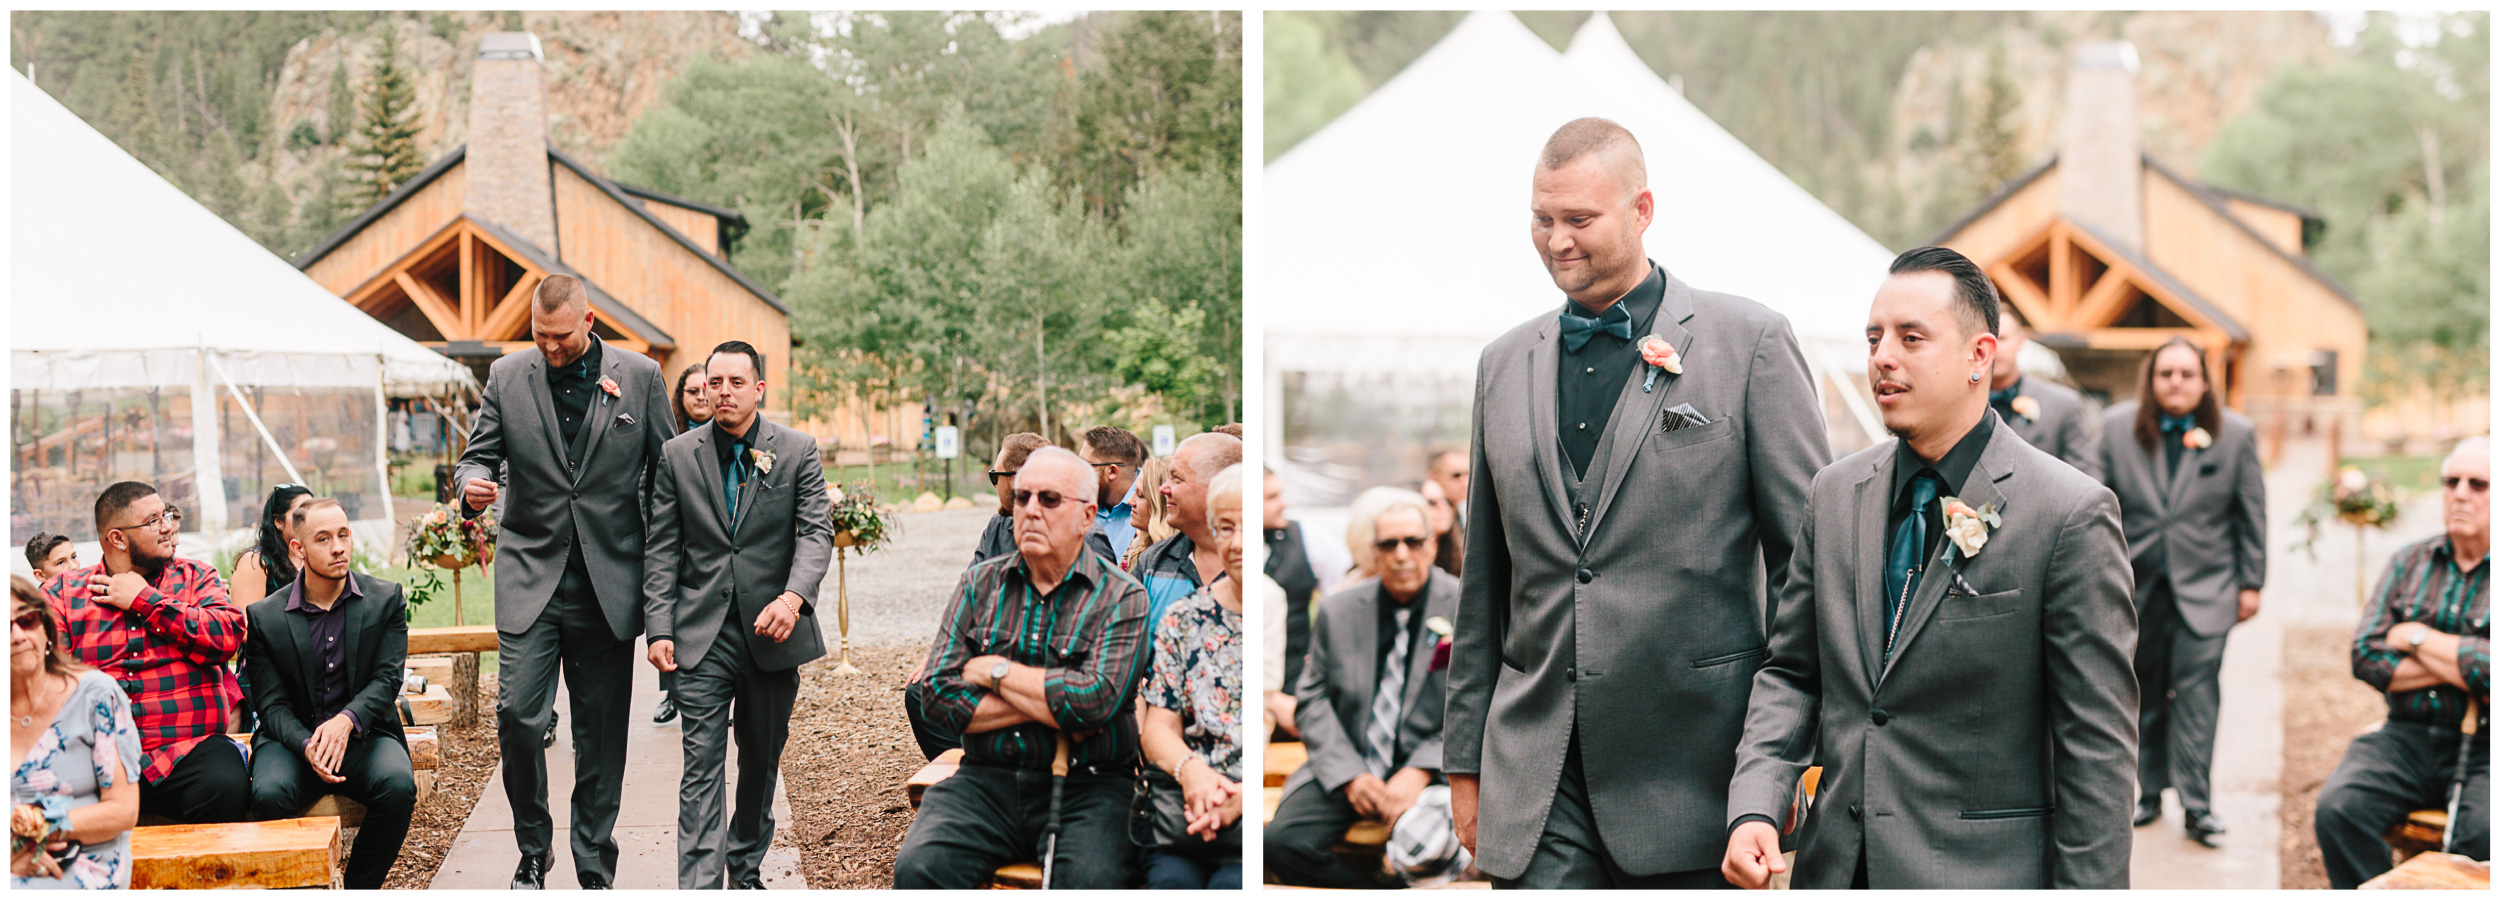 blackstone_rivers_ranch_wedding_64.jpg